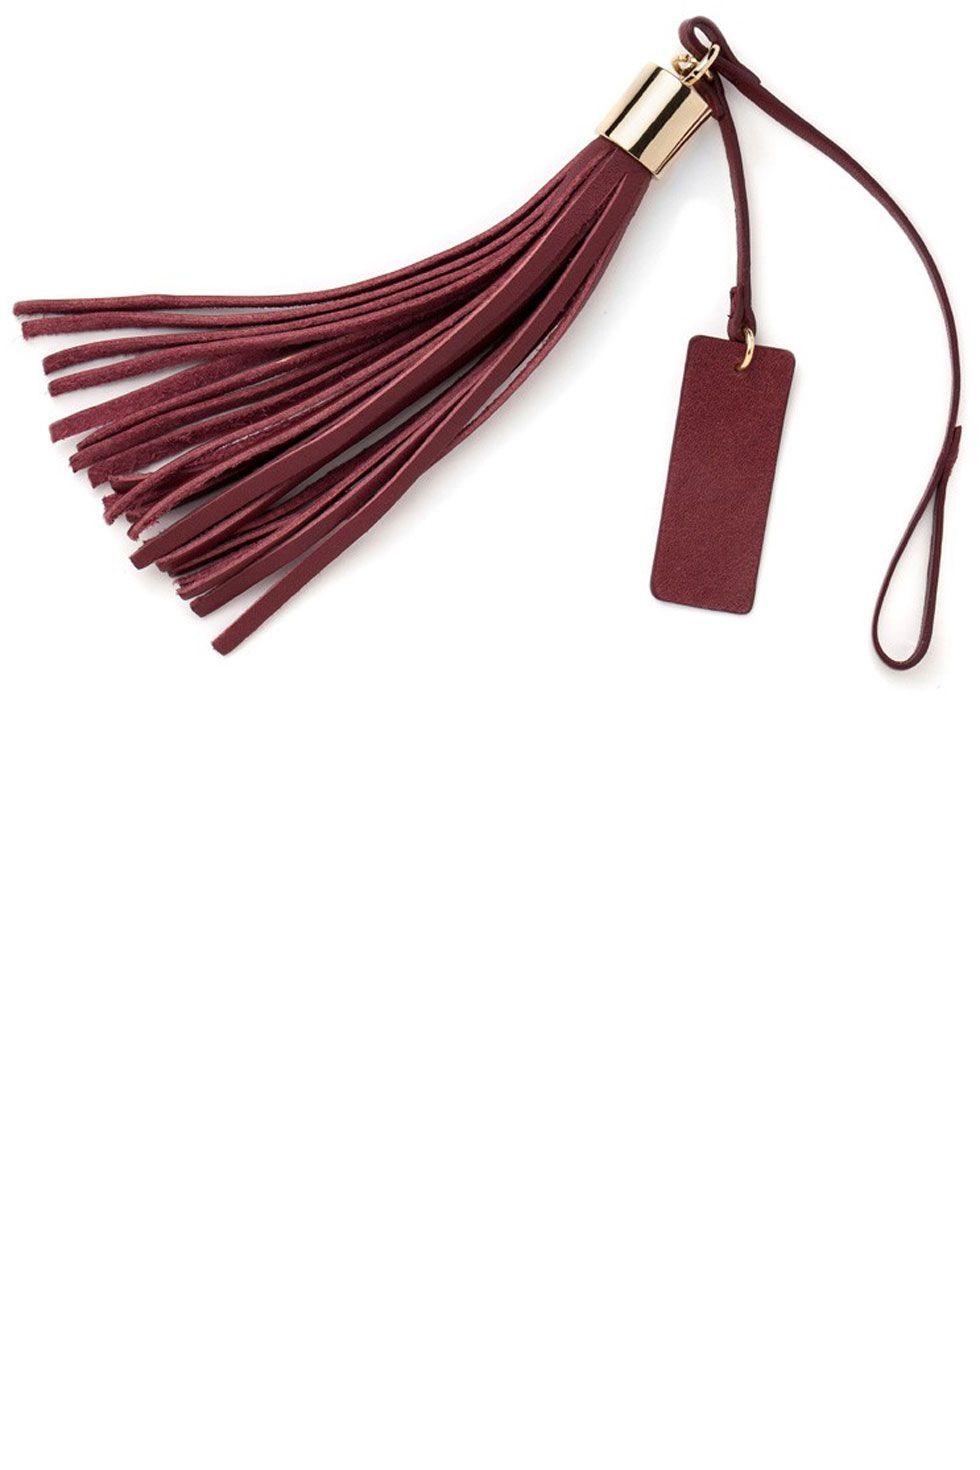 "<p>Cuyana Leather Bag Tassel, $35; <a href=""http://www.cuyana.com/leather-bag-tassel-wine.html"">cuyana.com</a></p>"